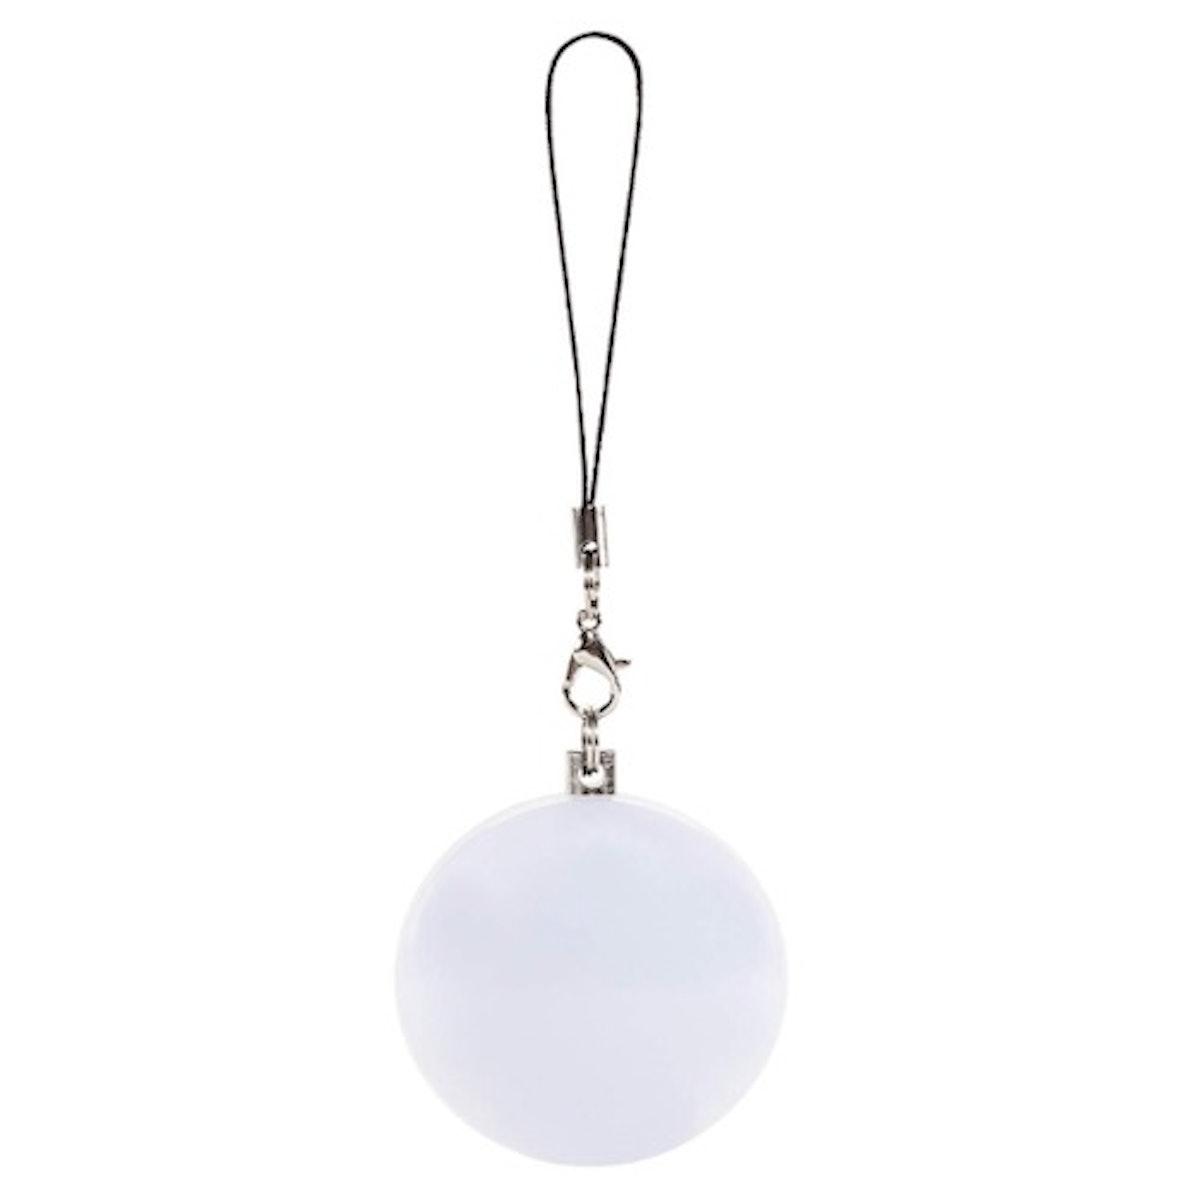 Wasserstein Handbag/Purse Light With Automatic Sensor